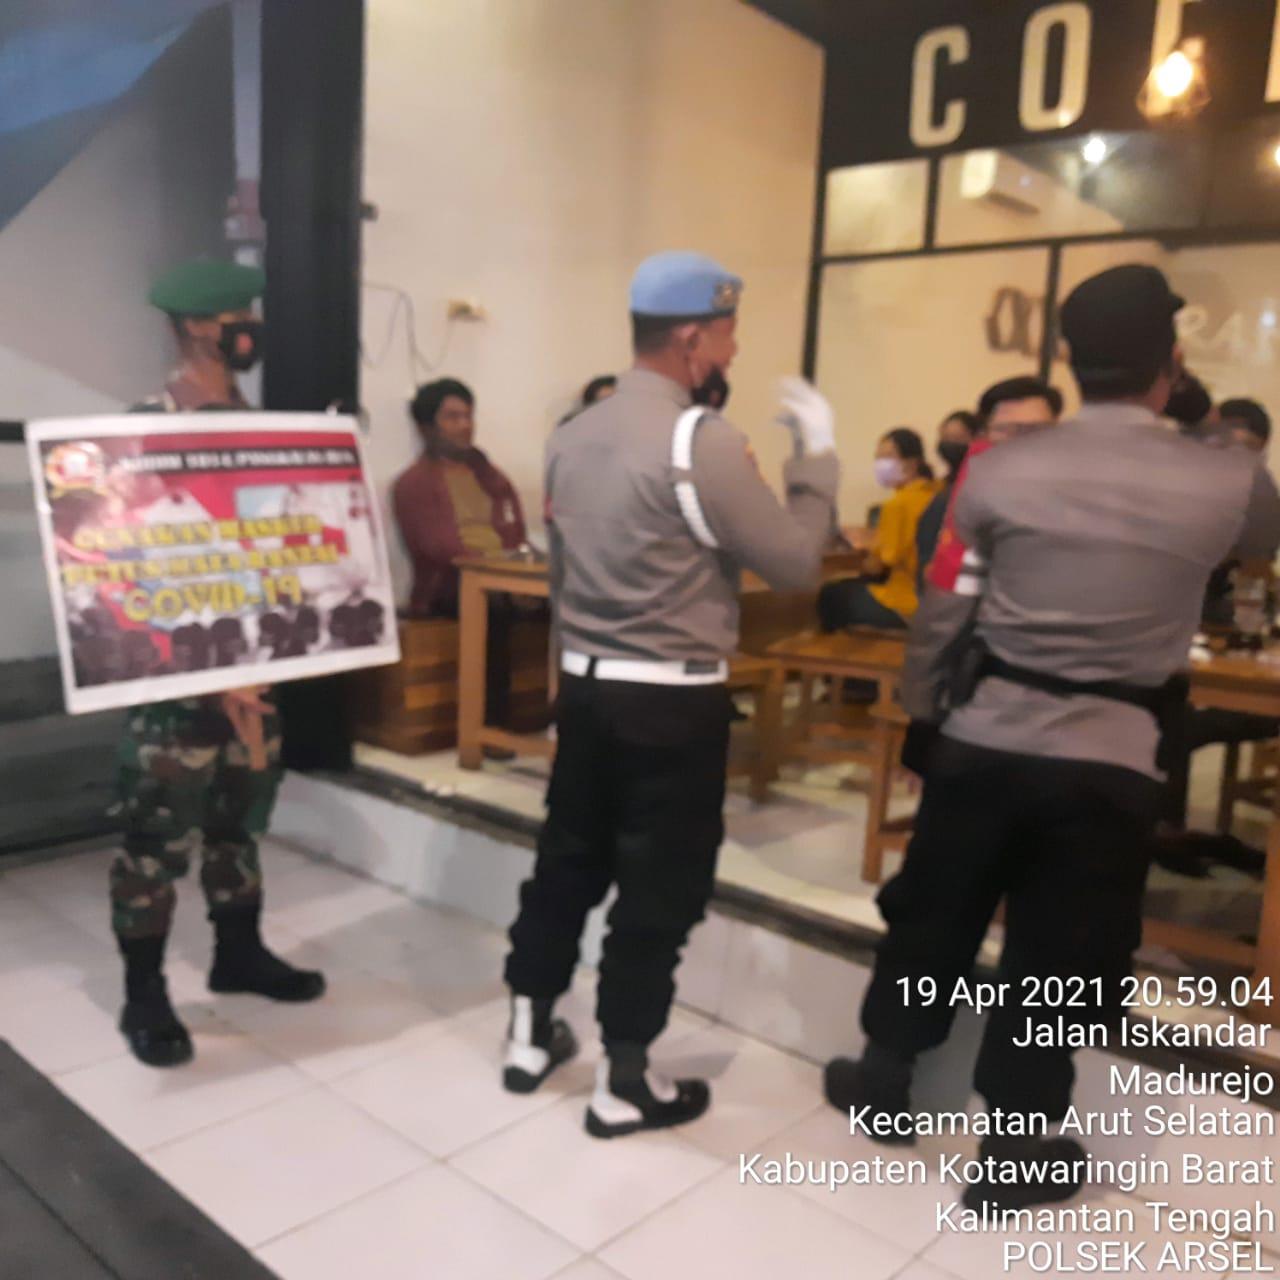 Pengunjung Cafe Kaget Saat Polisi Datang Razia Prokes